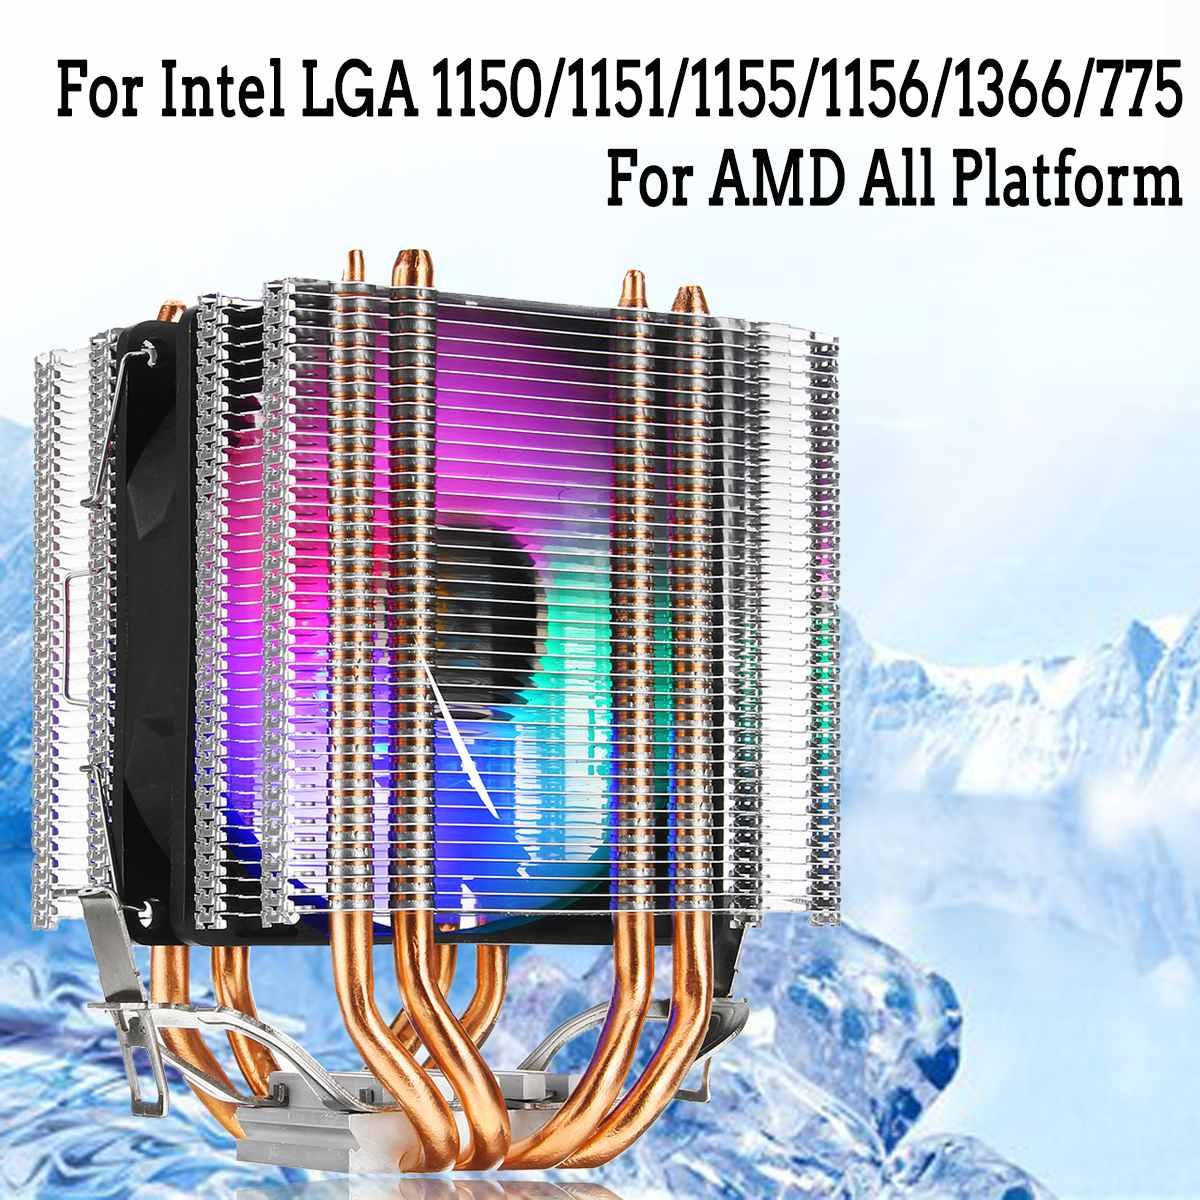 RGB LED CPU Cooler Fan 4pin 4 Heatpipe Dual Tower 12V Cooler Cooling Fan Heatsink for Intel LAG 1155 1156 775 for AMD Socket AM3